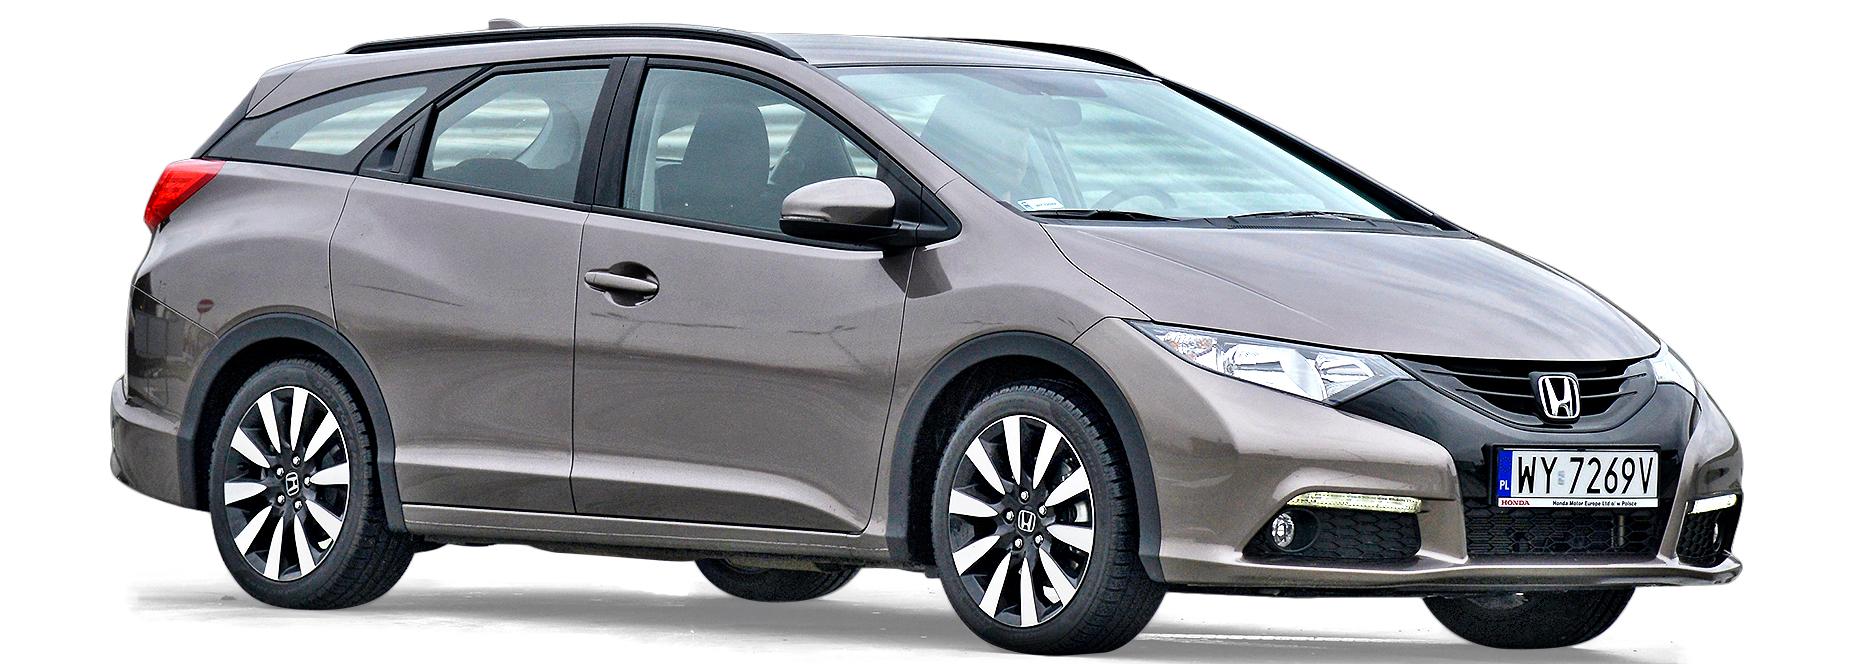 Honda Civic IX (2014-2017)